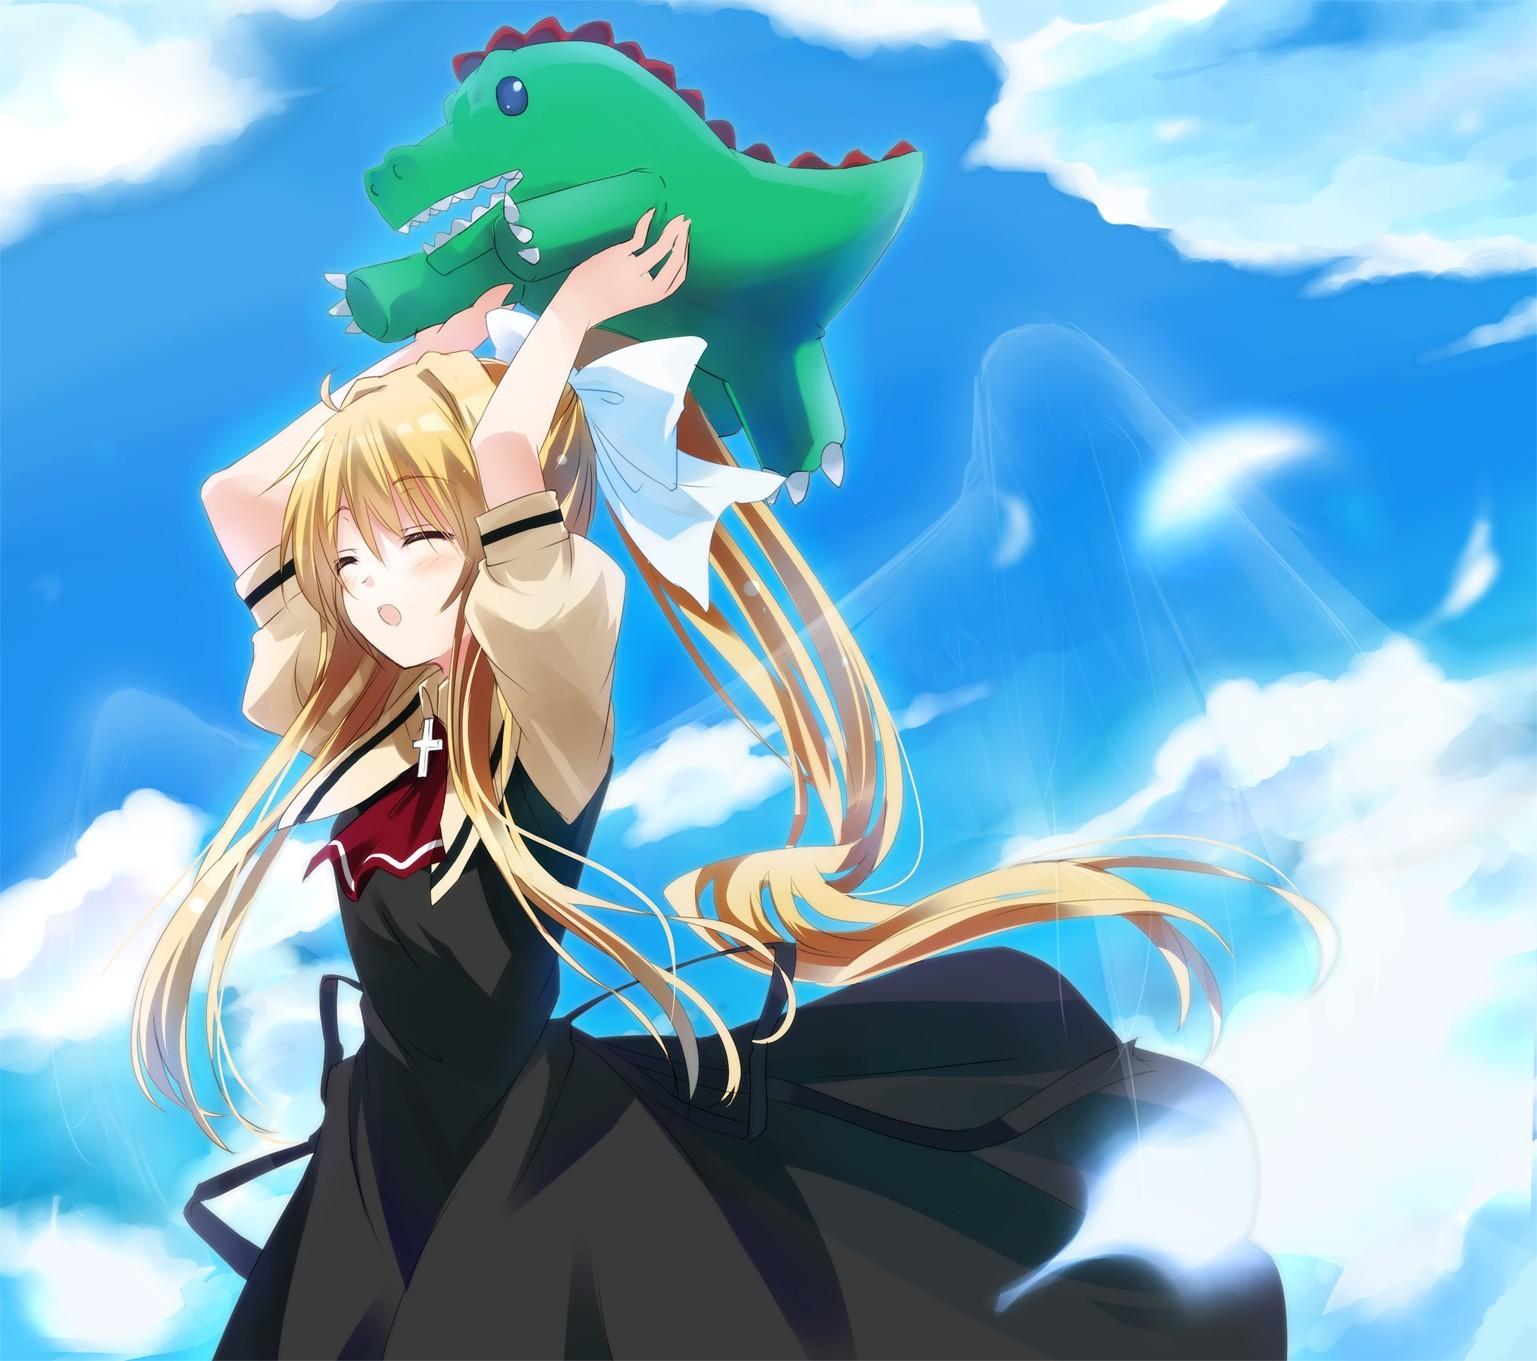 illustration blonde anime anime girls Air anime Kamio Misuzu screenshot computer wallpaper mangaka